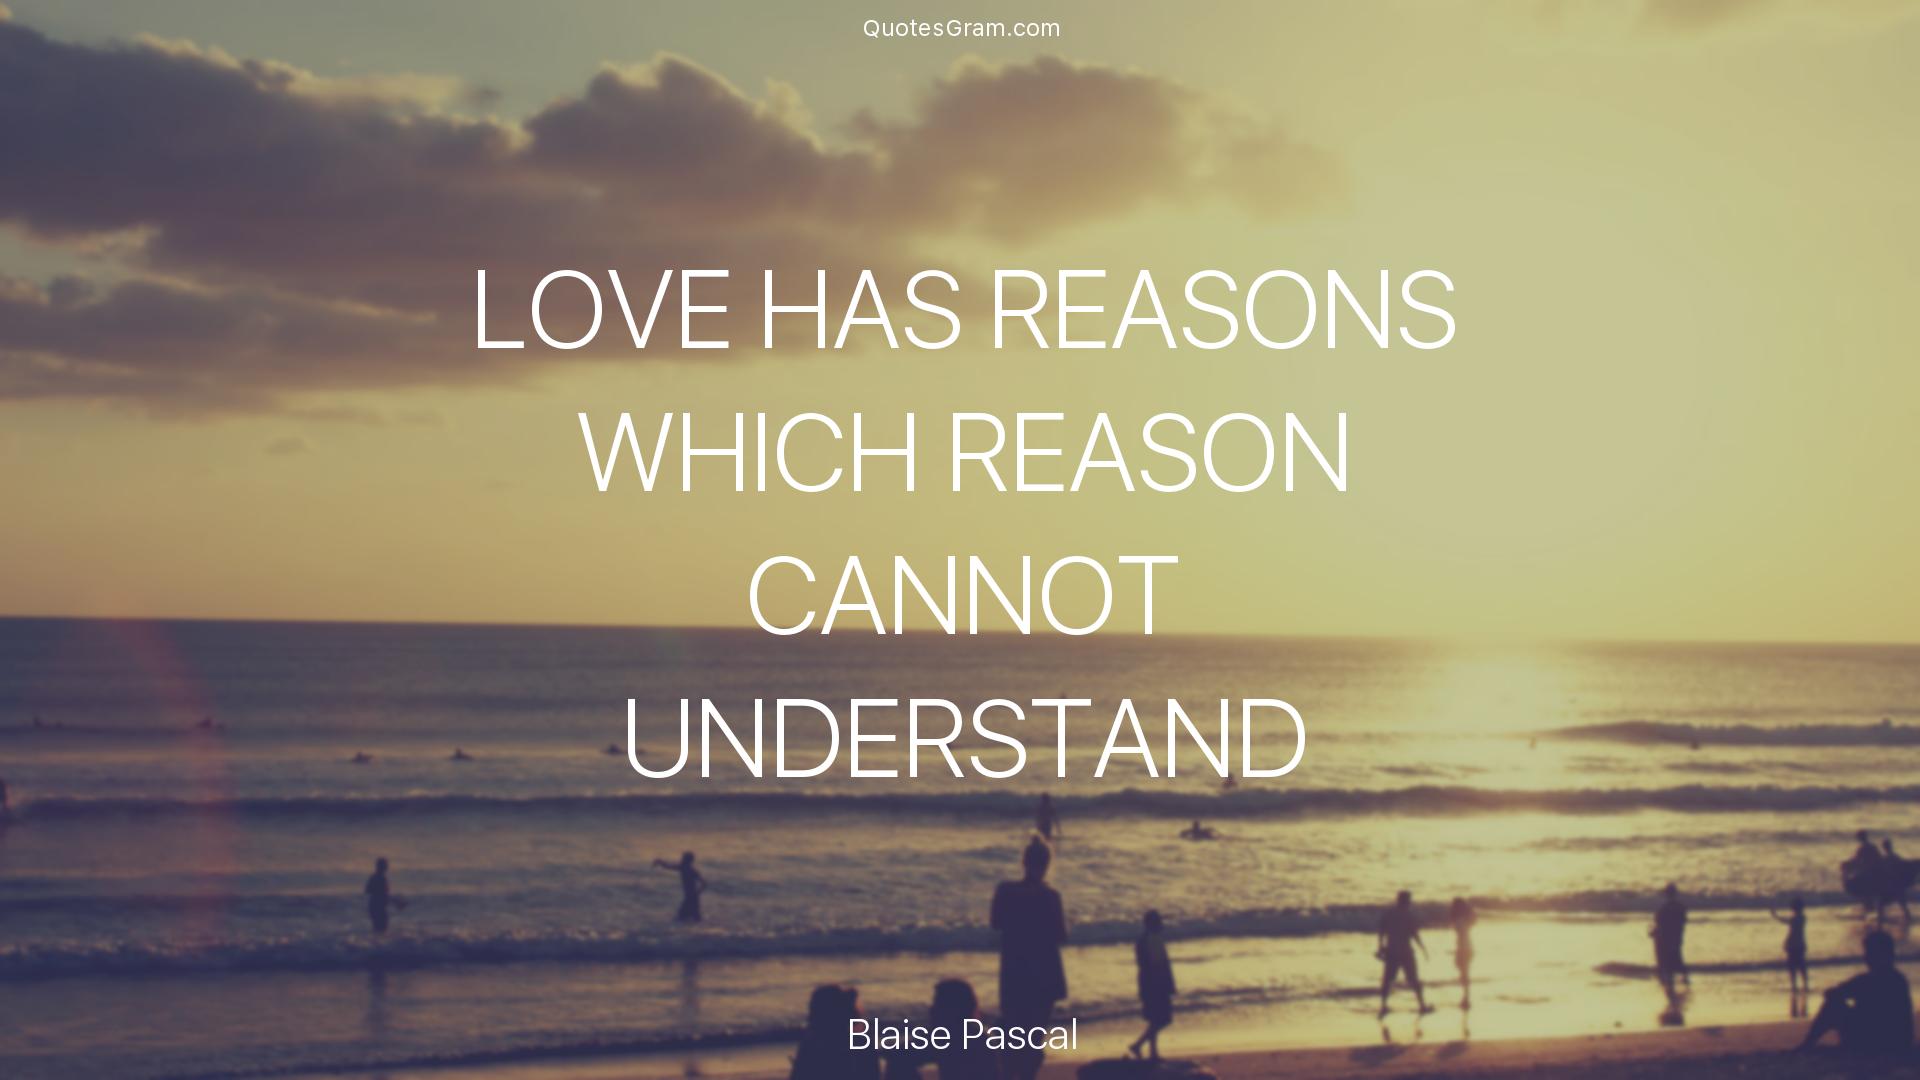 Love Romantic Quotes Blaisepascalquotelovehasreasonswhichreasoncannot